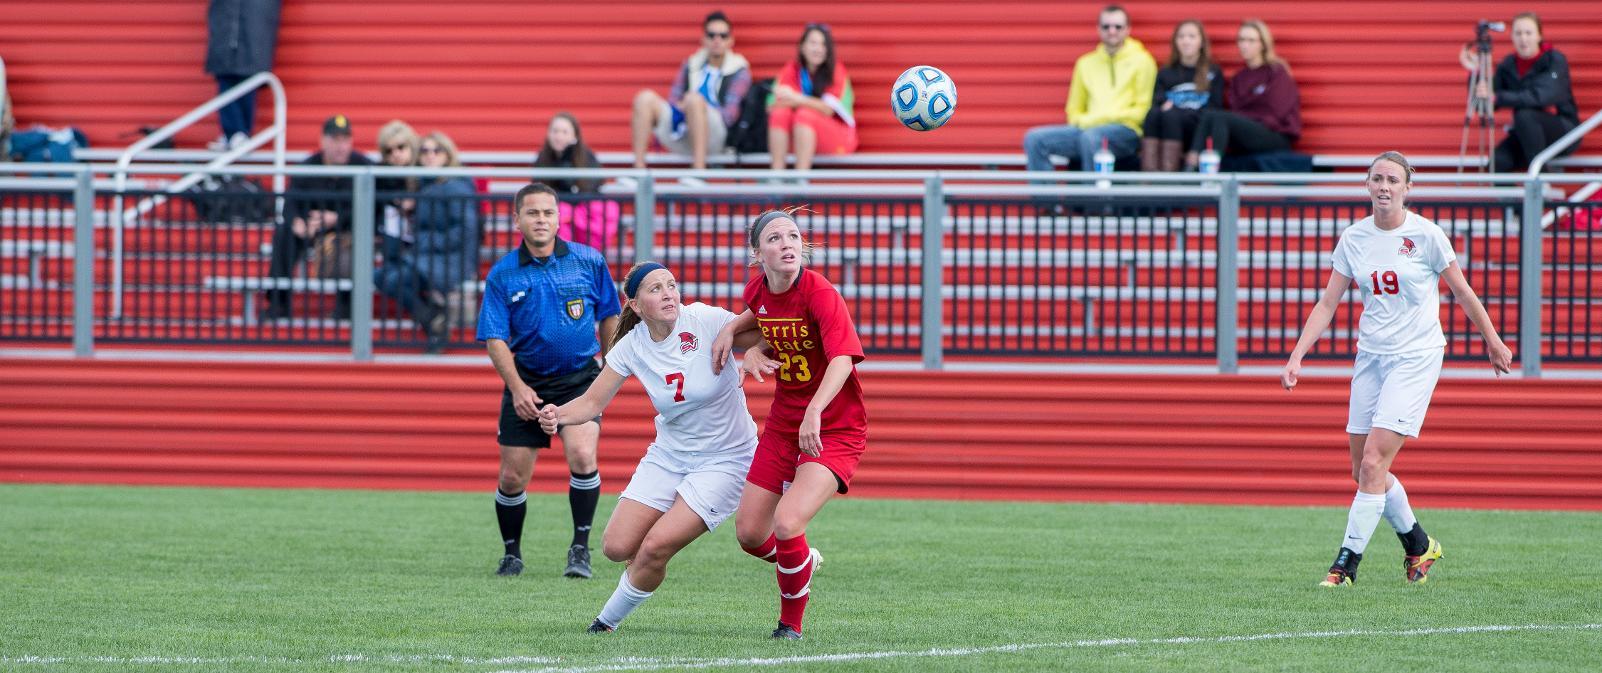 Women S Soccer Vs Ferris State October 10 2014 Saginaw Valley